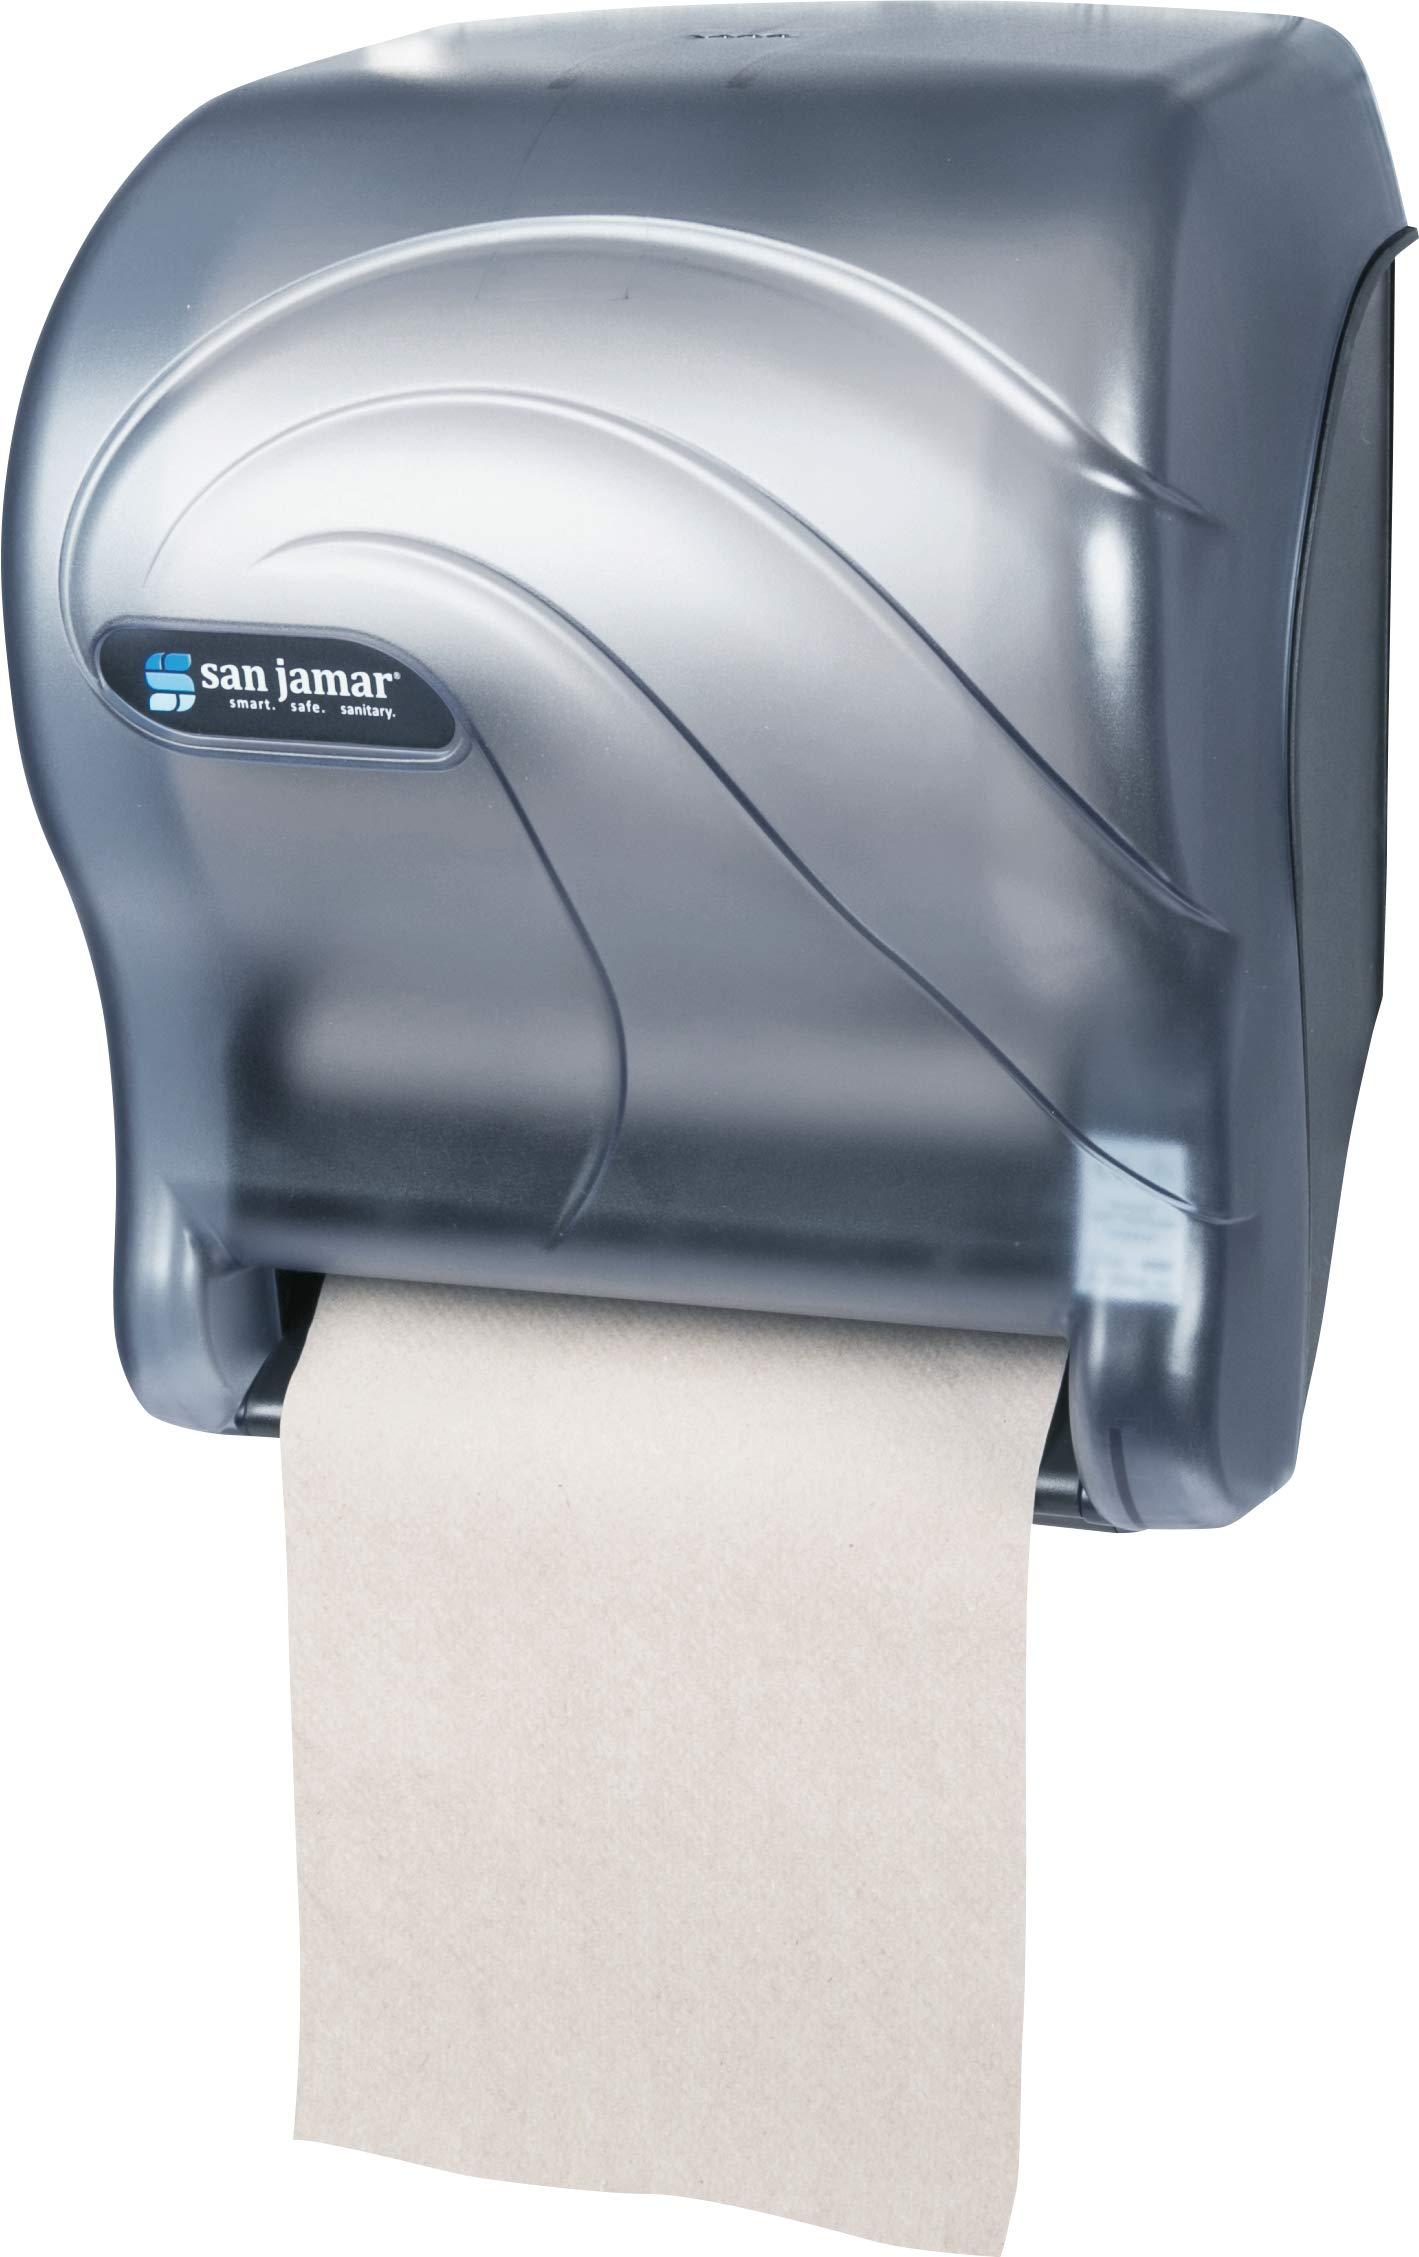 San Jamar T8090TBL Tear-N-Dry Essence Oceans Hands Free Paper Towel Dispenser, Arctic Blue